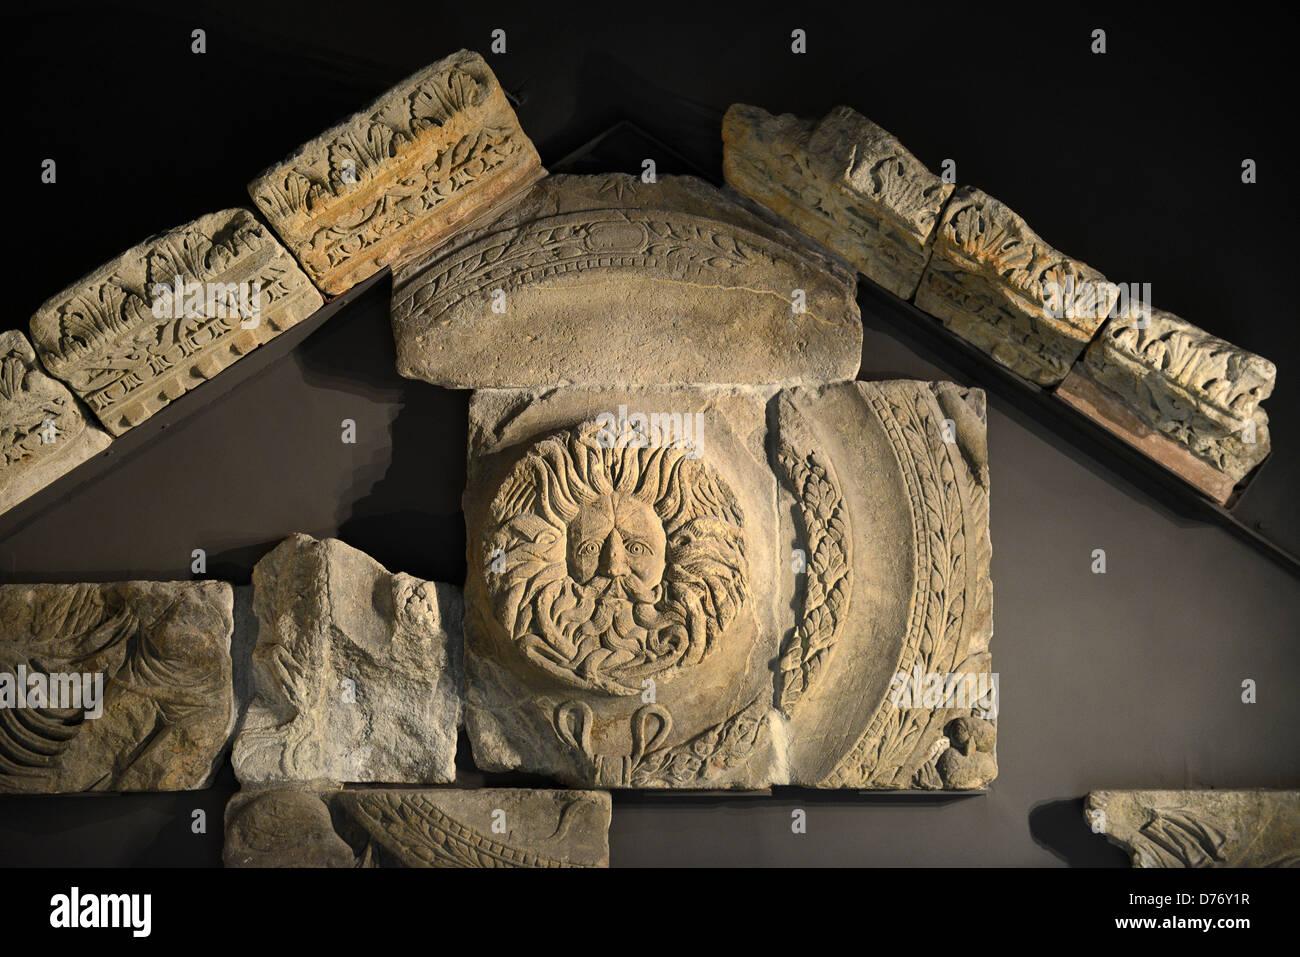 Gorgon's head stonework at Roman Baths in Bath, Somerset, England - Stock Image